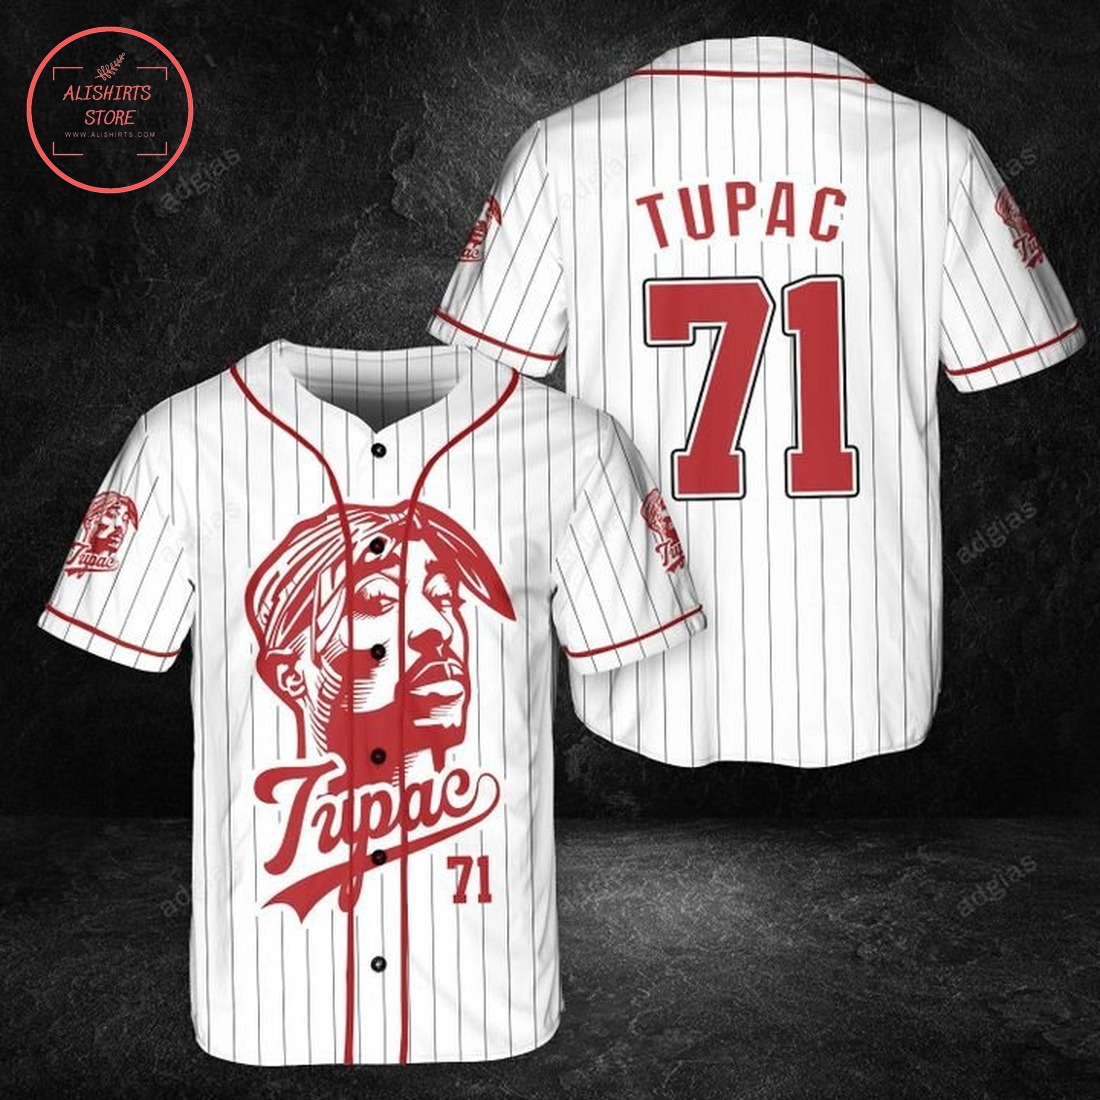 Tupac original stripe baseball Jersey